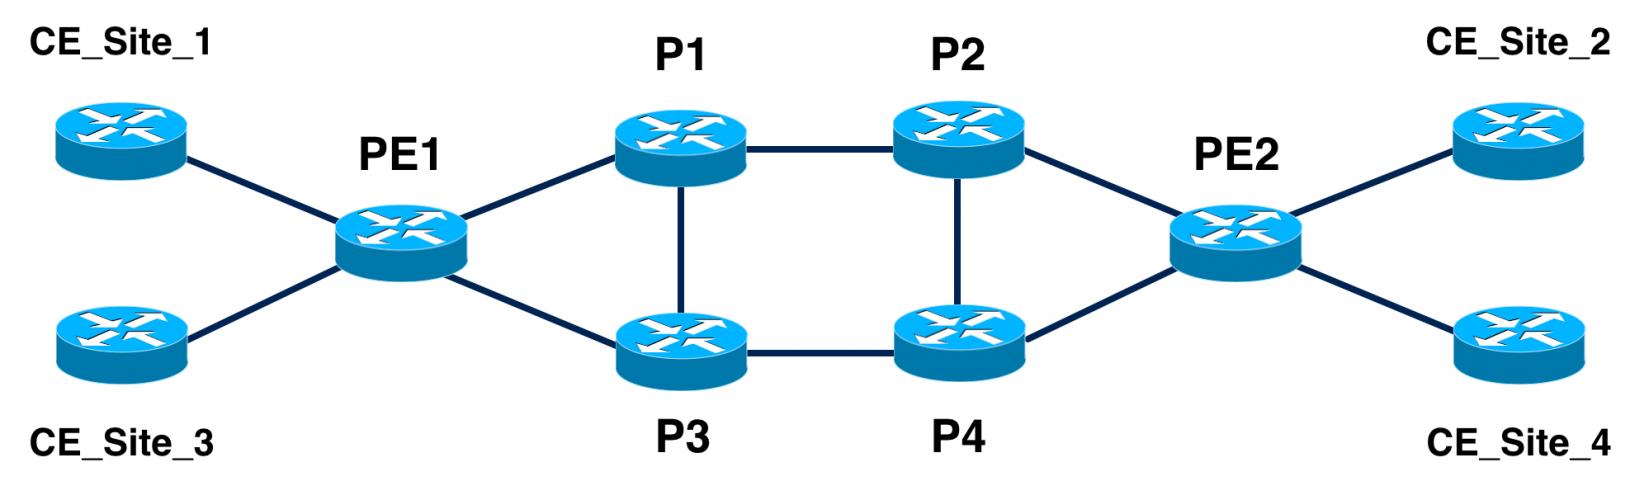 MPLS Diagram Terabit Systems